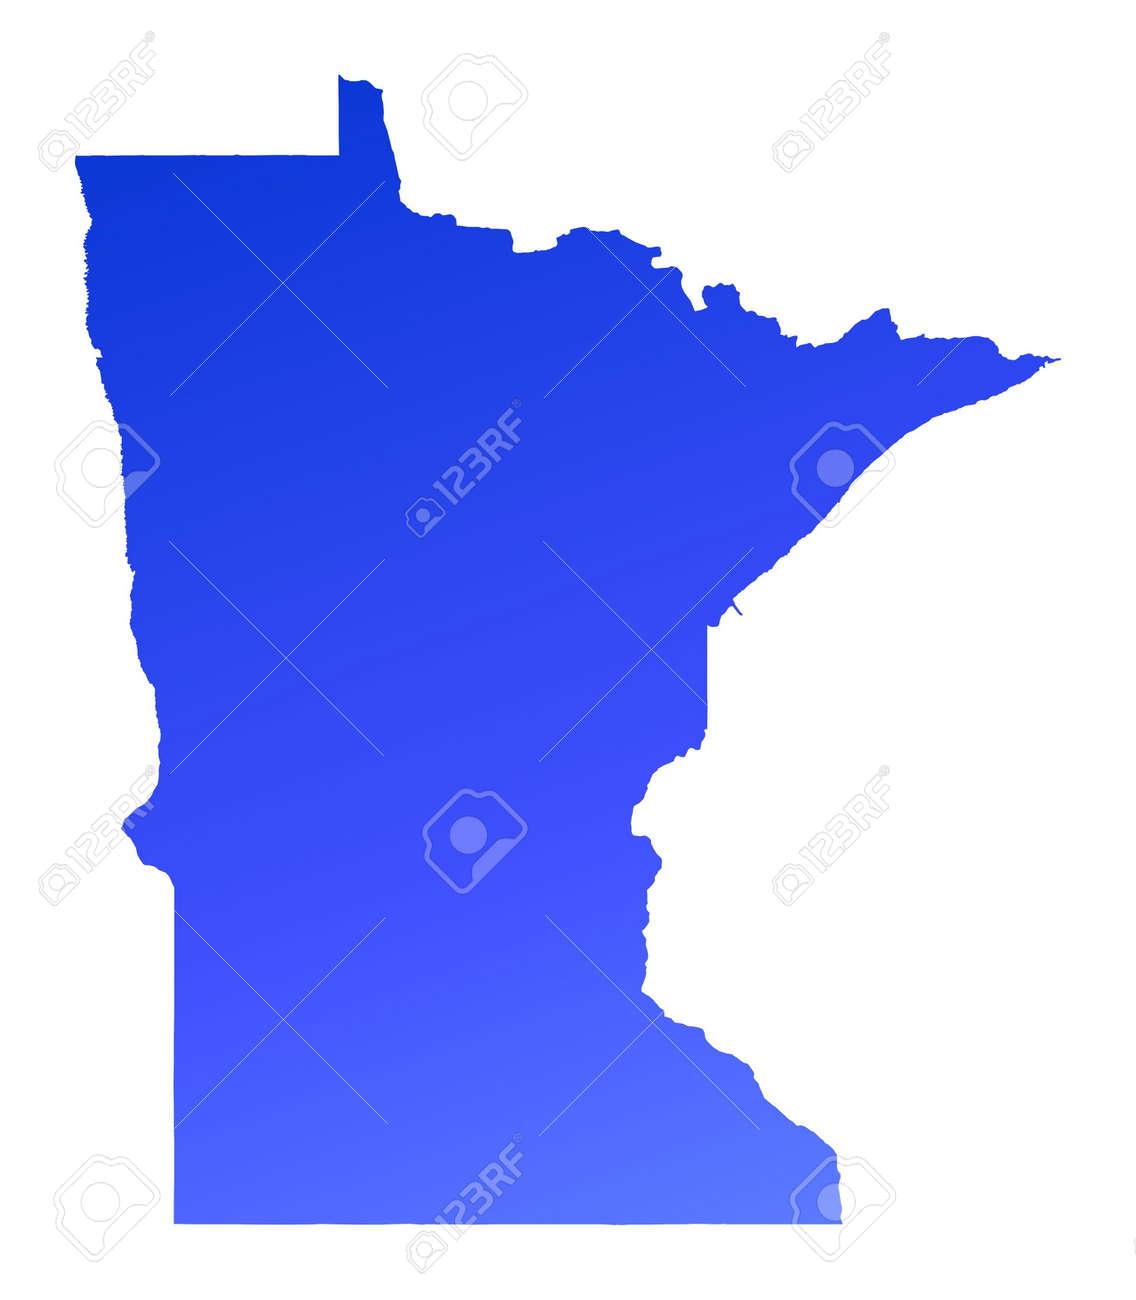 Blue Gradient Minnesota Map USA Detailed Mercator Projection - Minnesota map usa